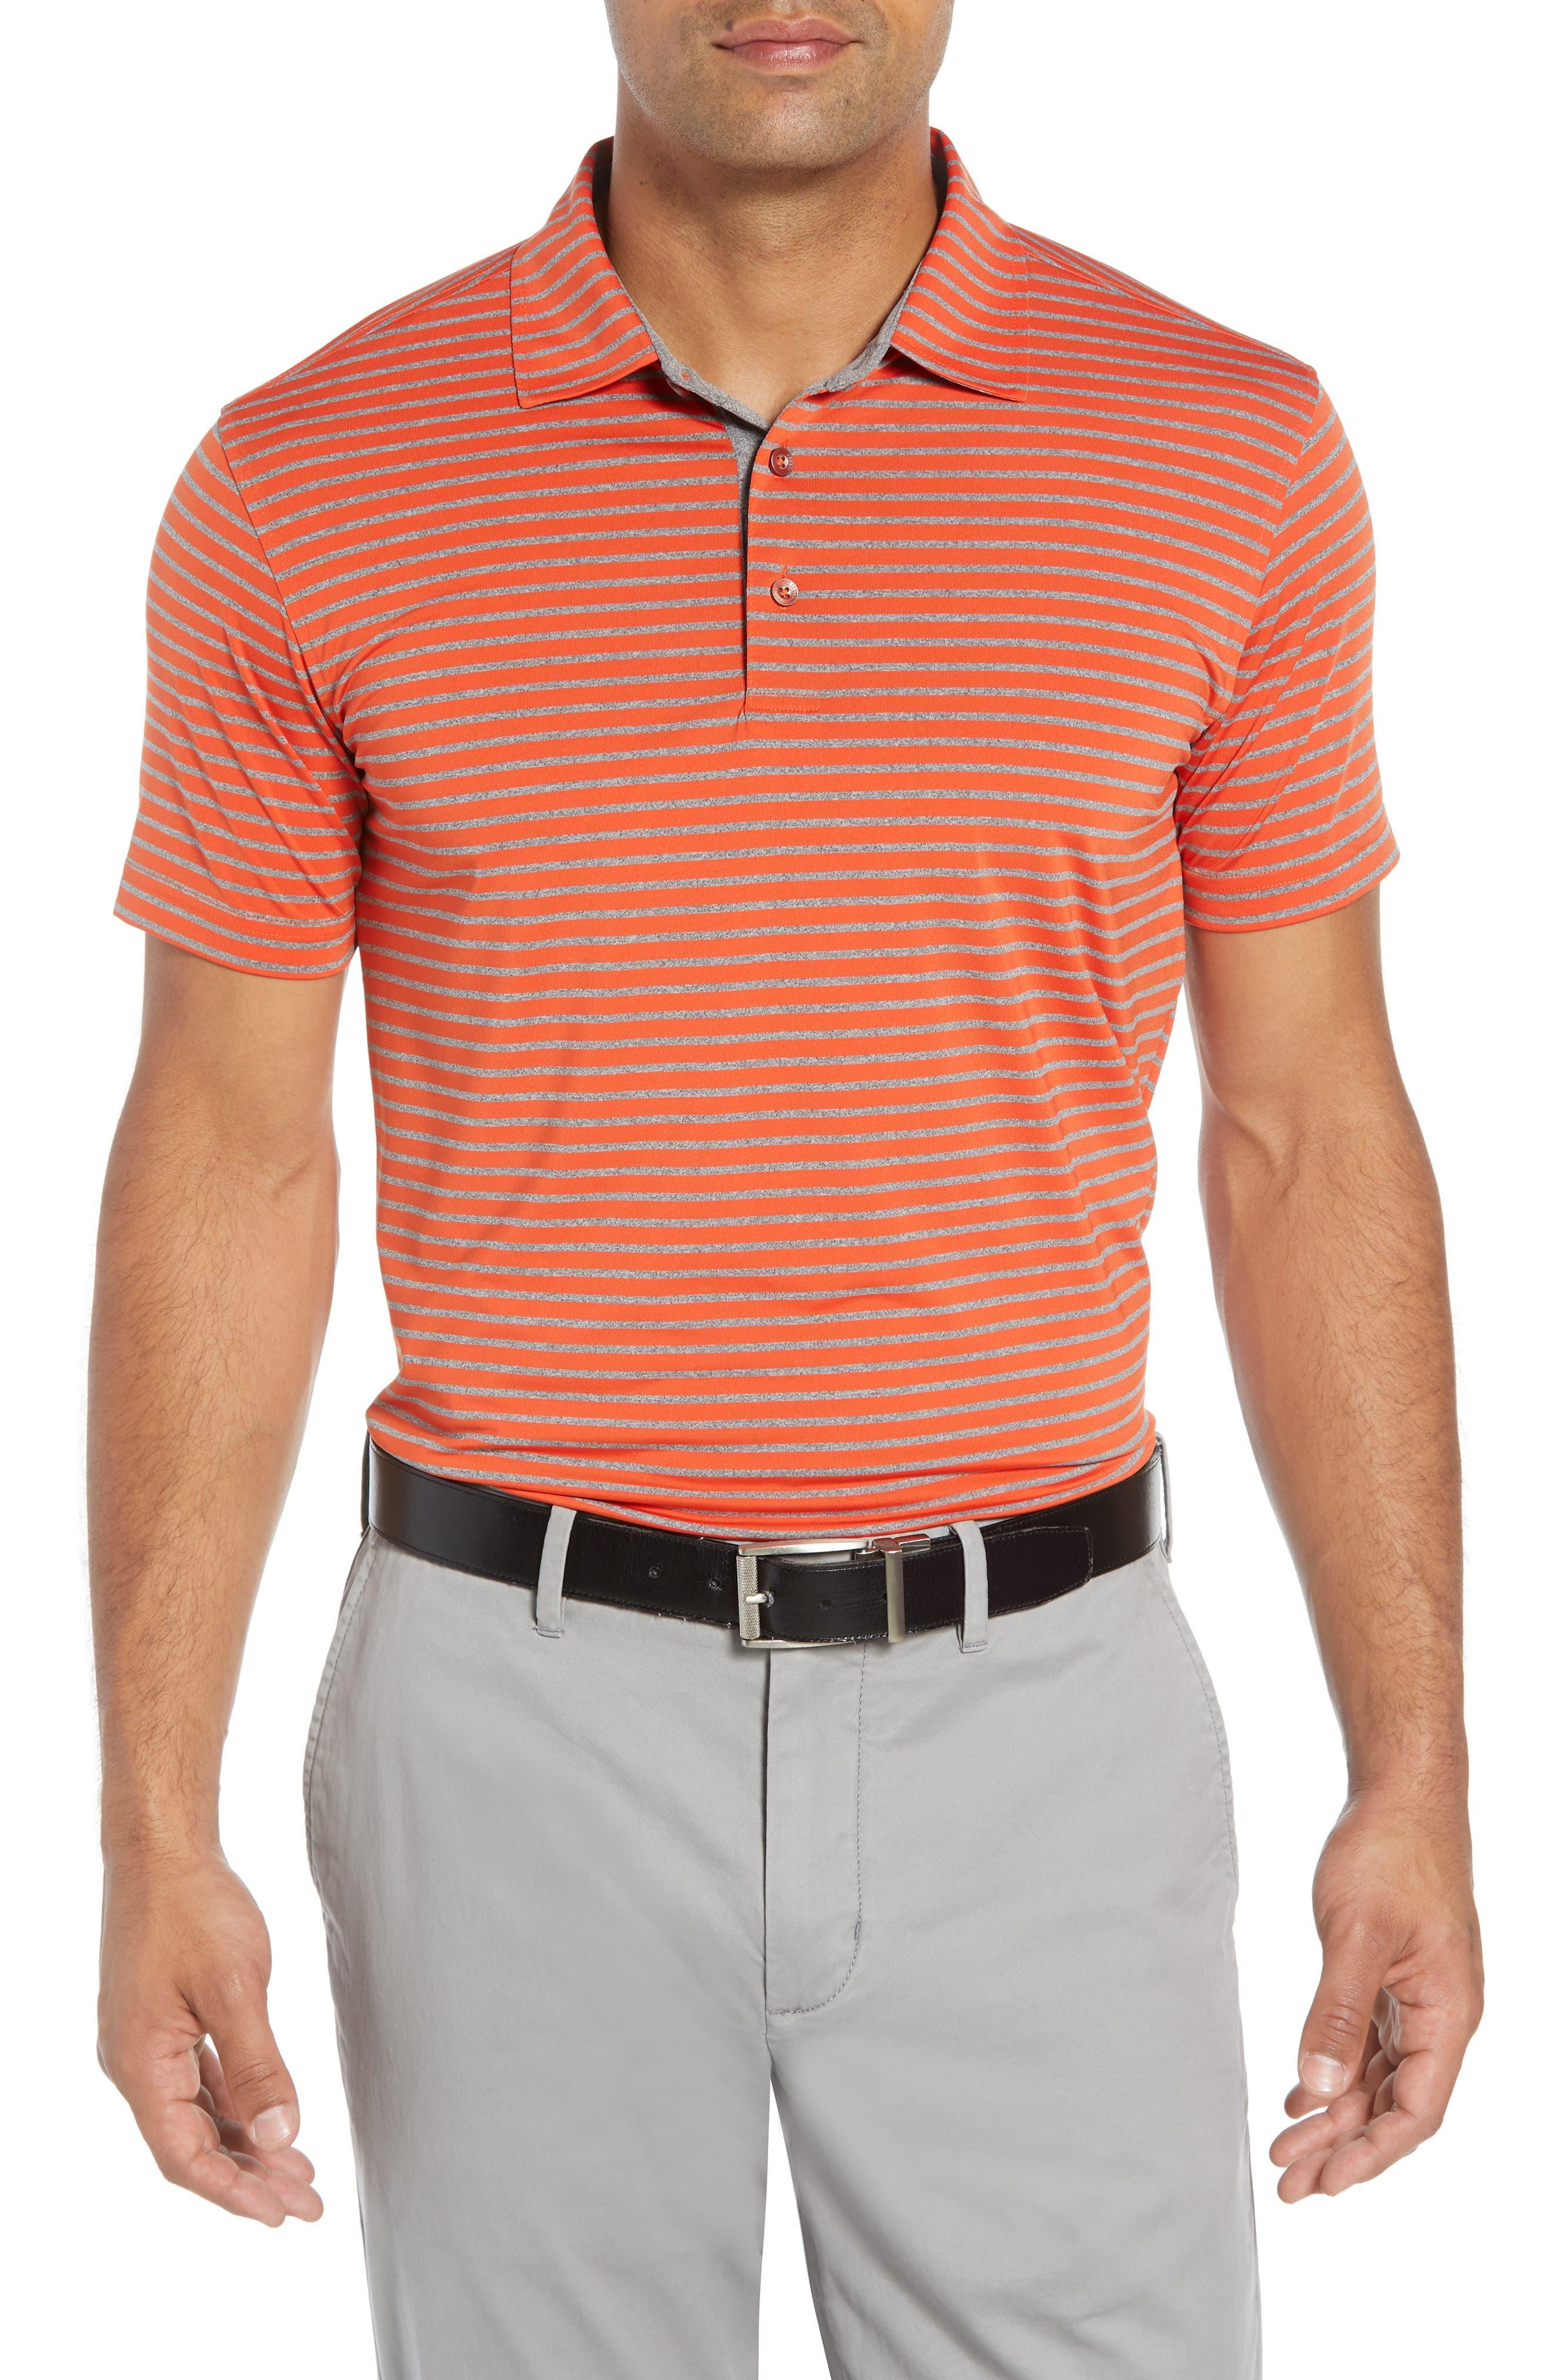 BOBBY JONES Control Stripe Jersey Polo in Orange